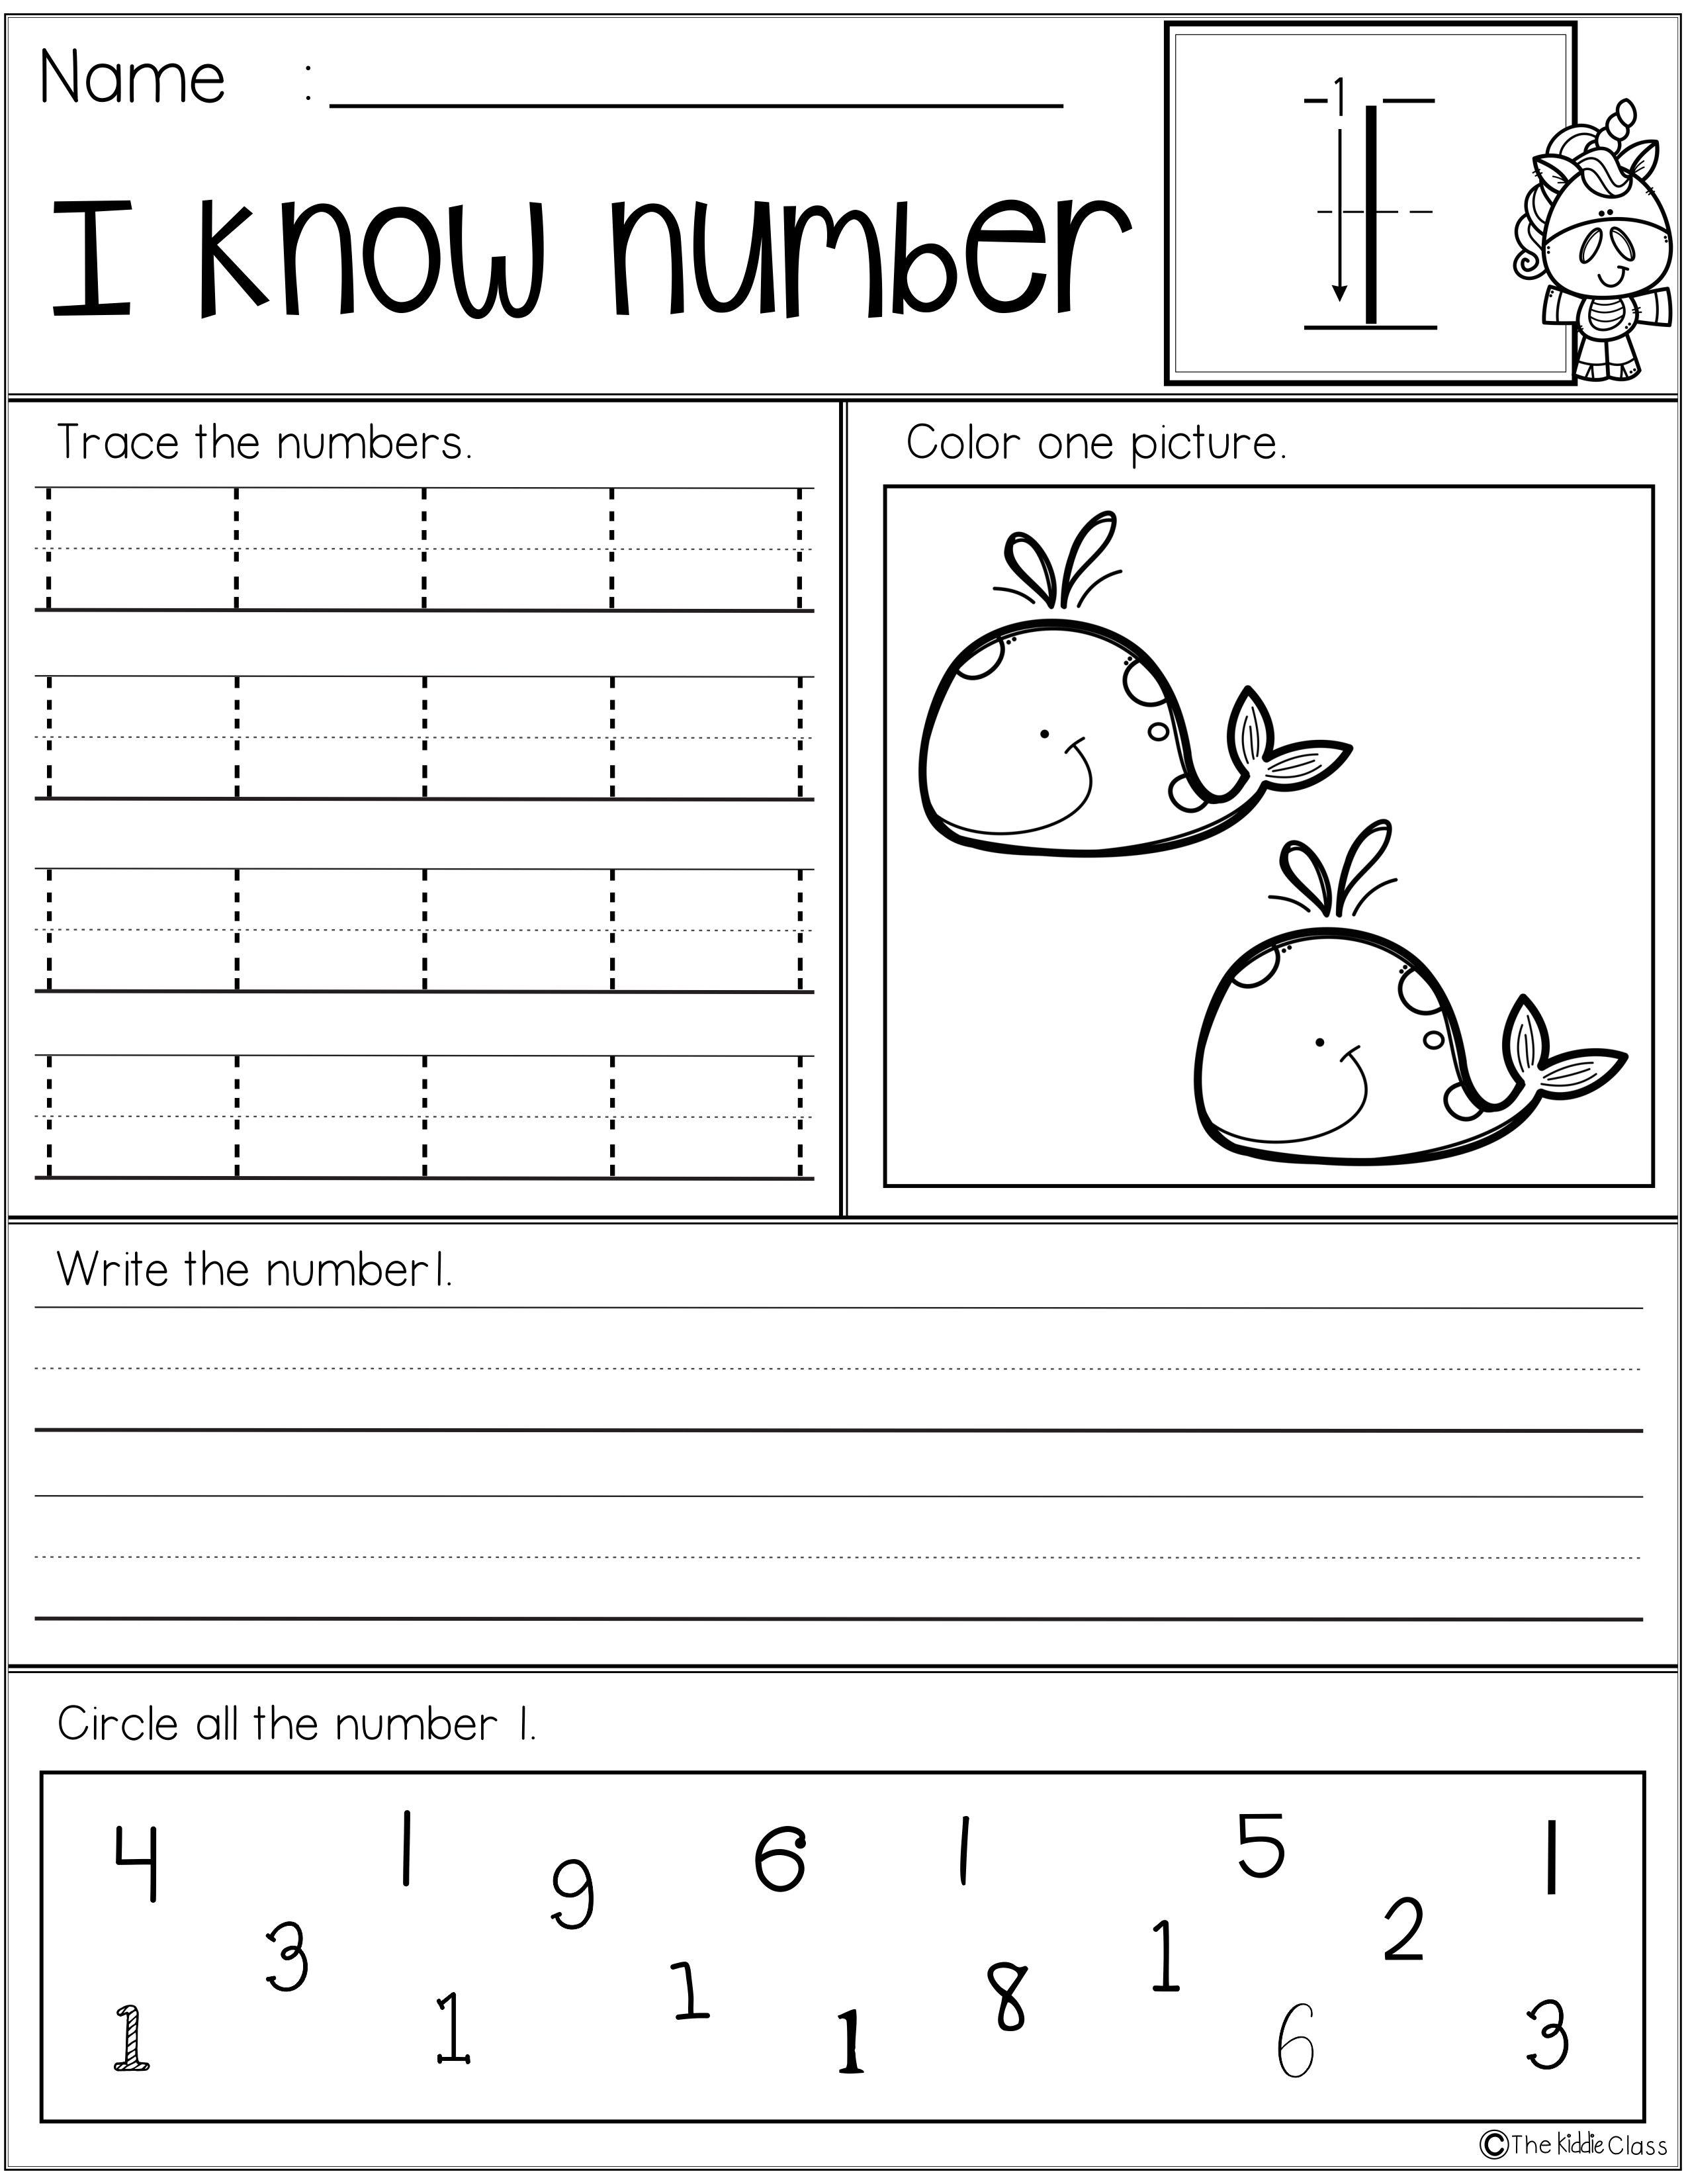 https://cute766.info/numbers-worksheets-learning-numbers-for-preschool-kindergarten-and-grade-1-k5-learning/ [ 91 x 3300 Pixel ]